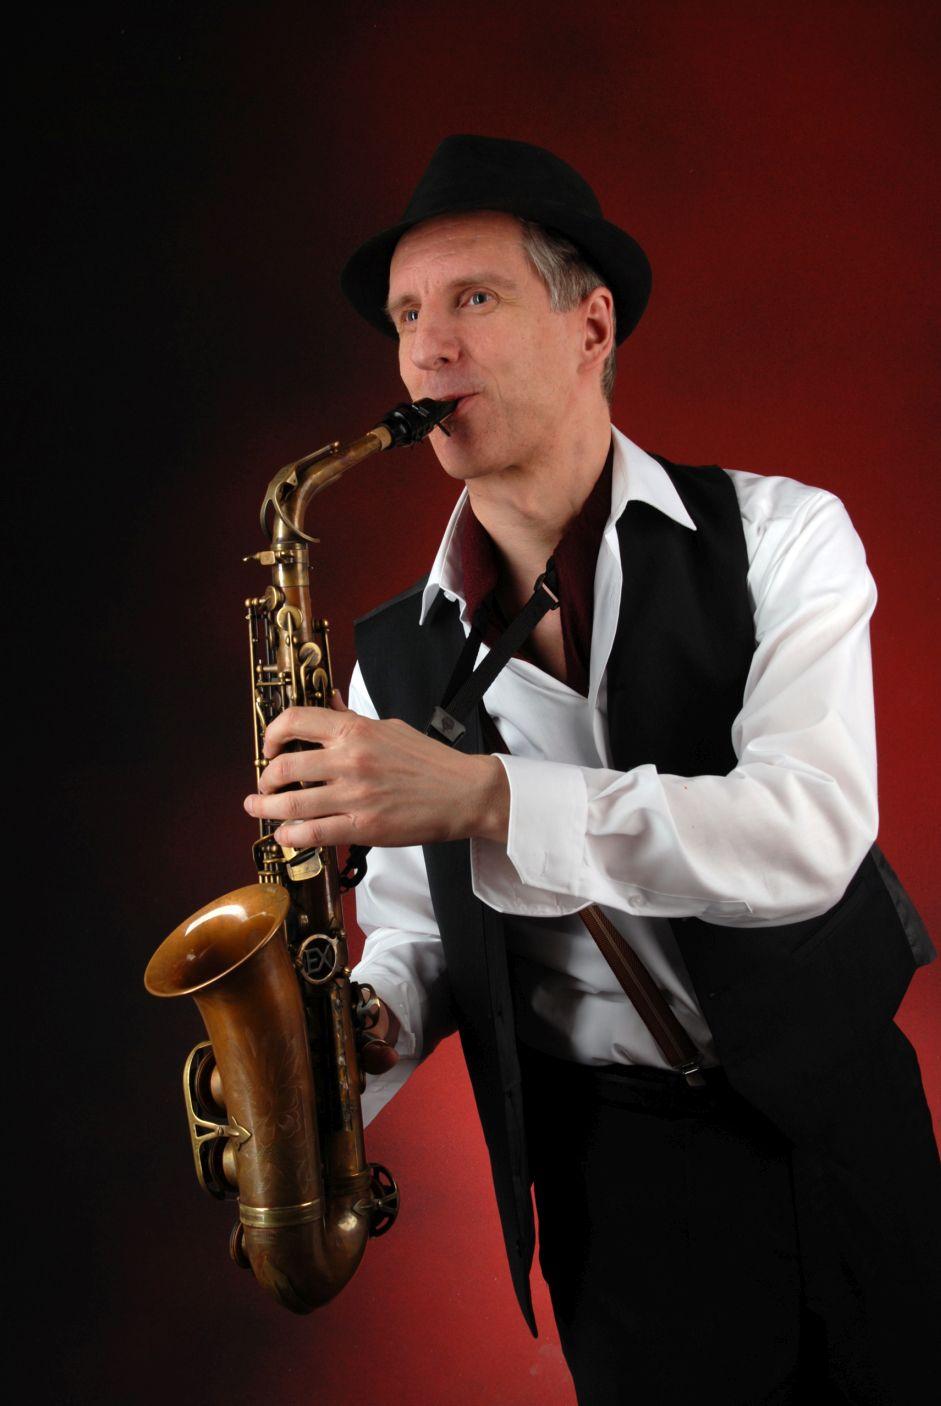 Saxophon solo, mit oder ohne Halbplaybacks